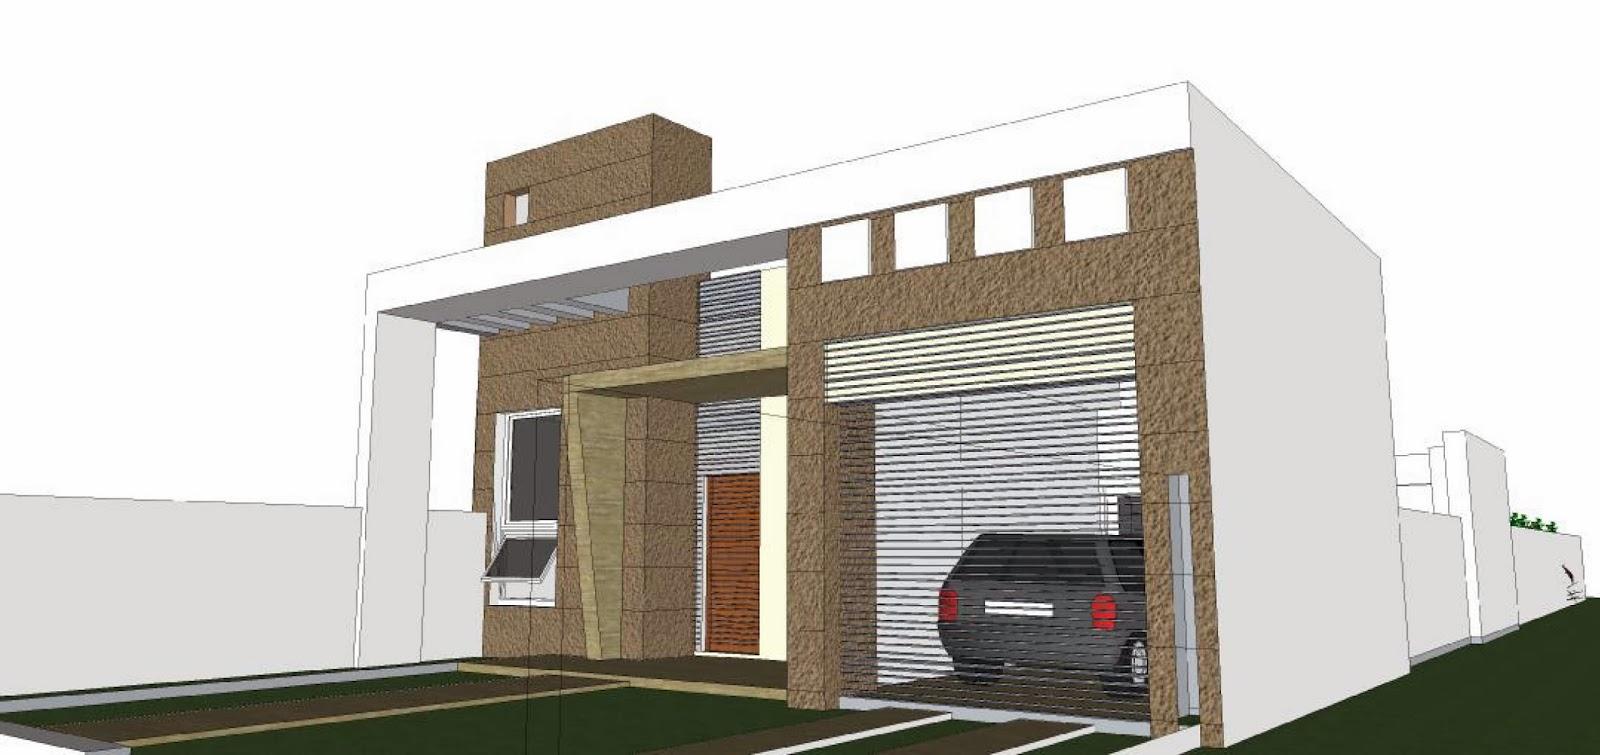 Arquitecta miriam di leo dise o exterior vivienda for Diseno vivienda